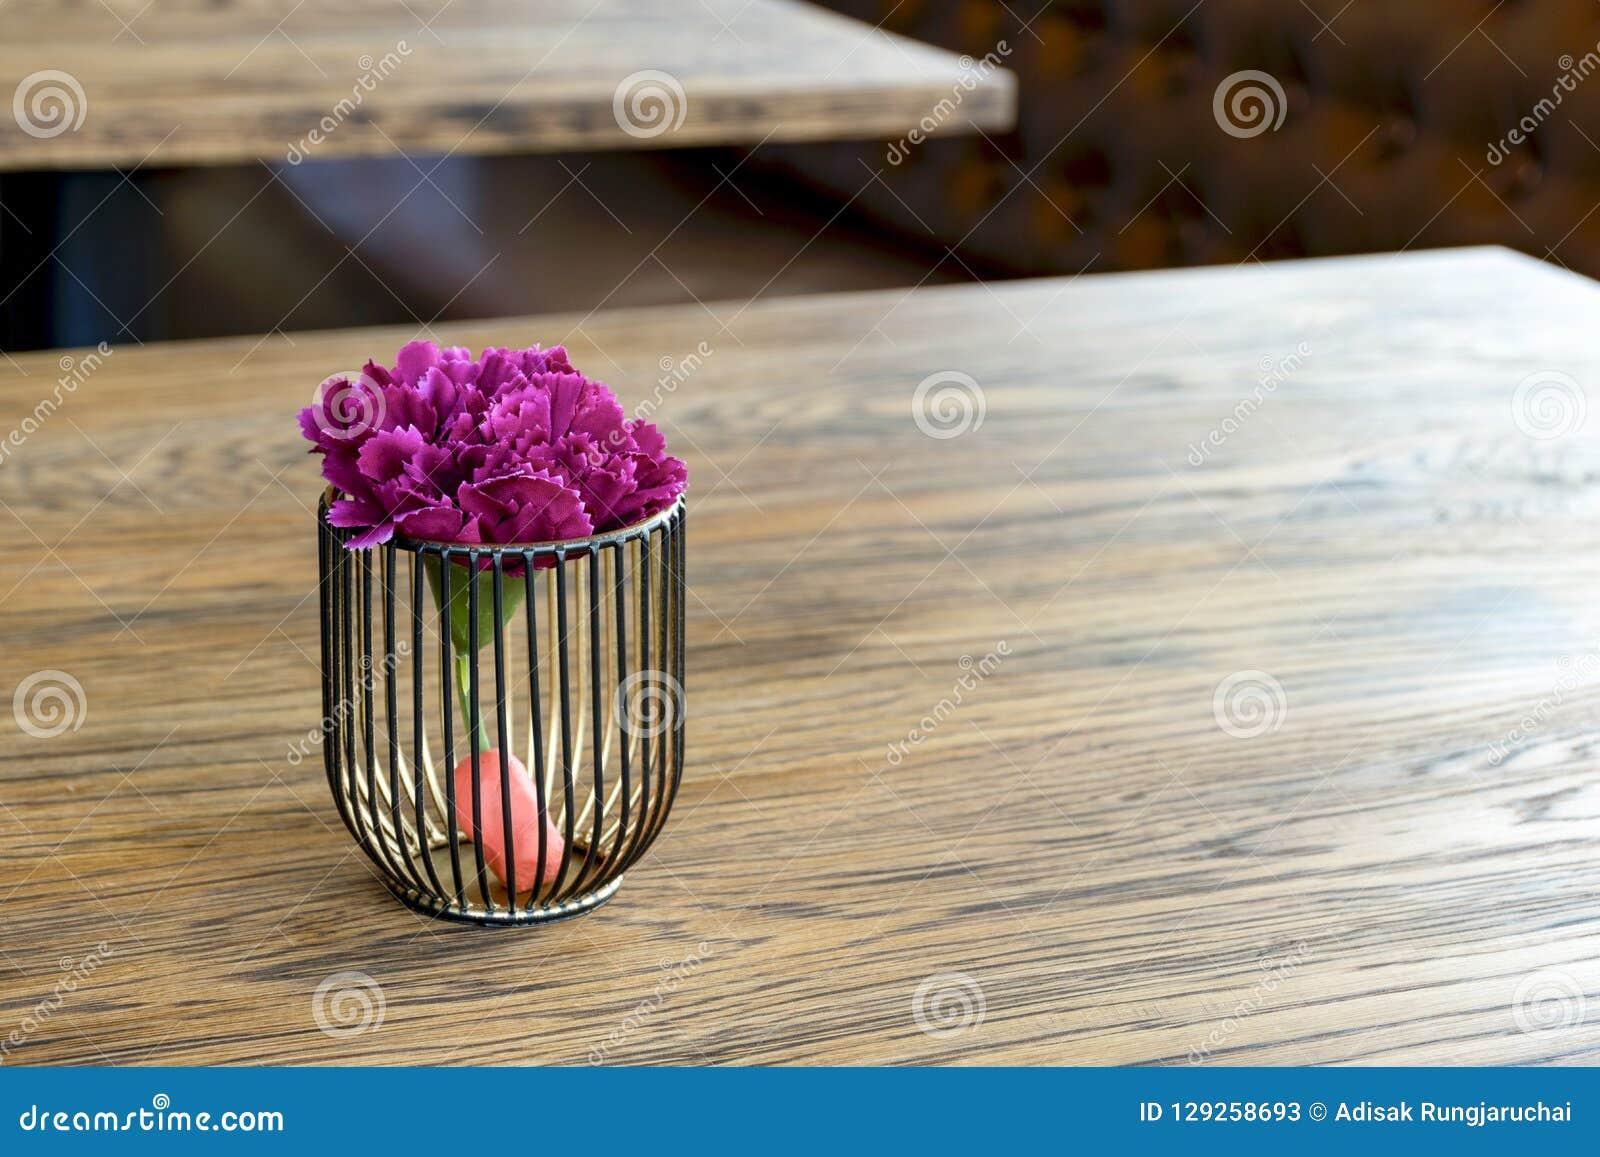 Artificial wood flowerpot on wooden table, small light brown colArtificial wood flowerpot on wooden table, small light brown colou